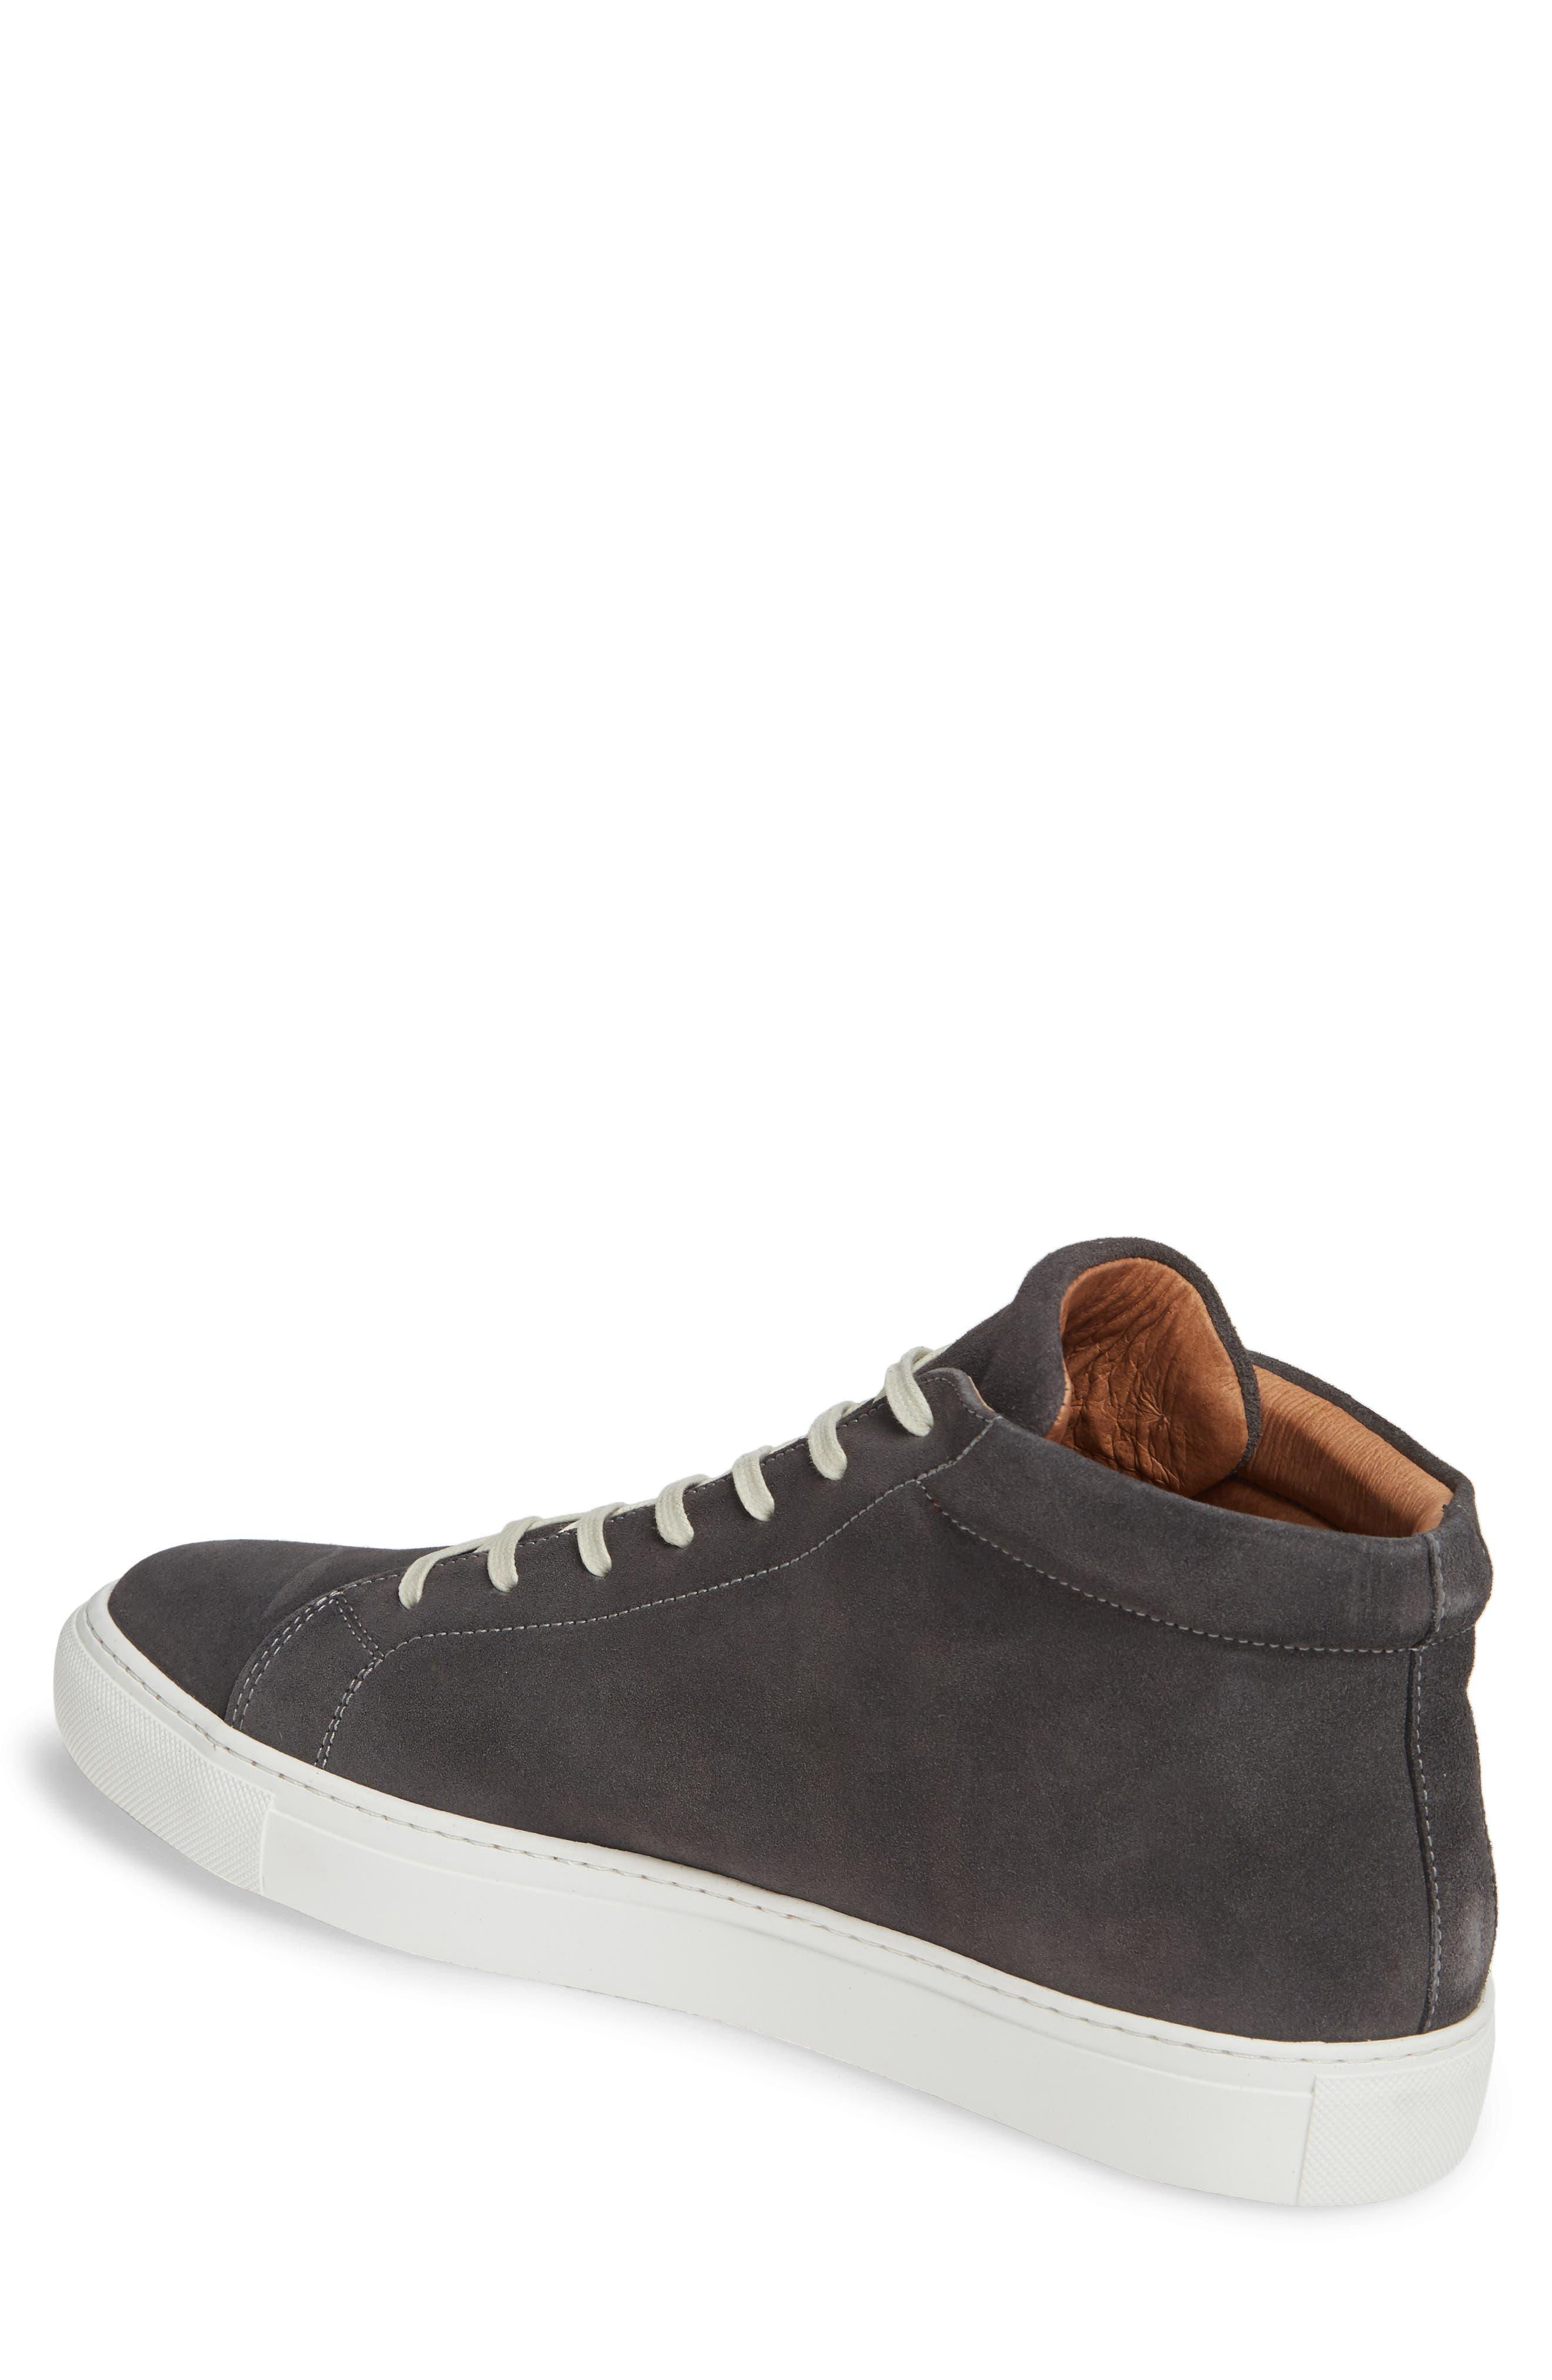 ,                             Deacon Mid Sneaker,                             Alternate thumbnail 8, color,                             022